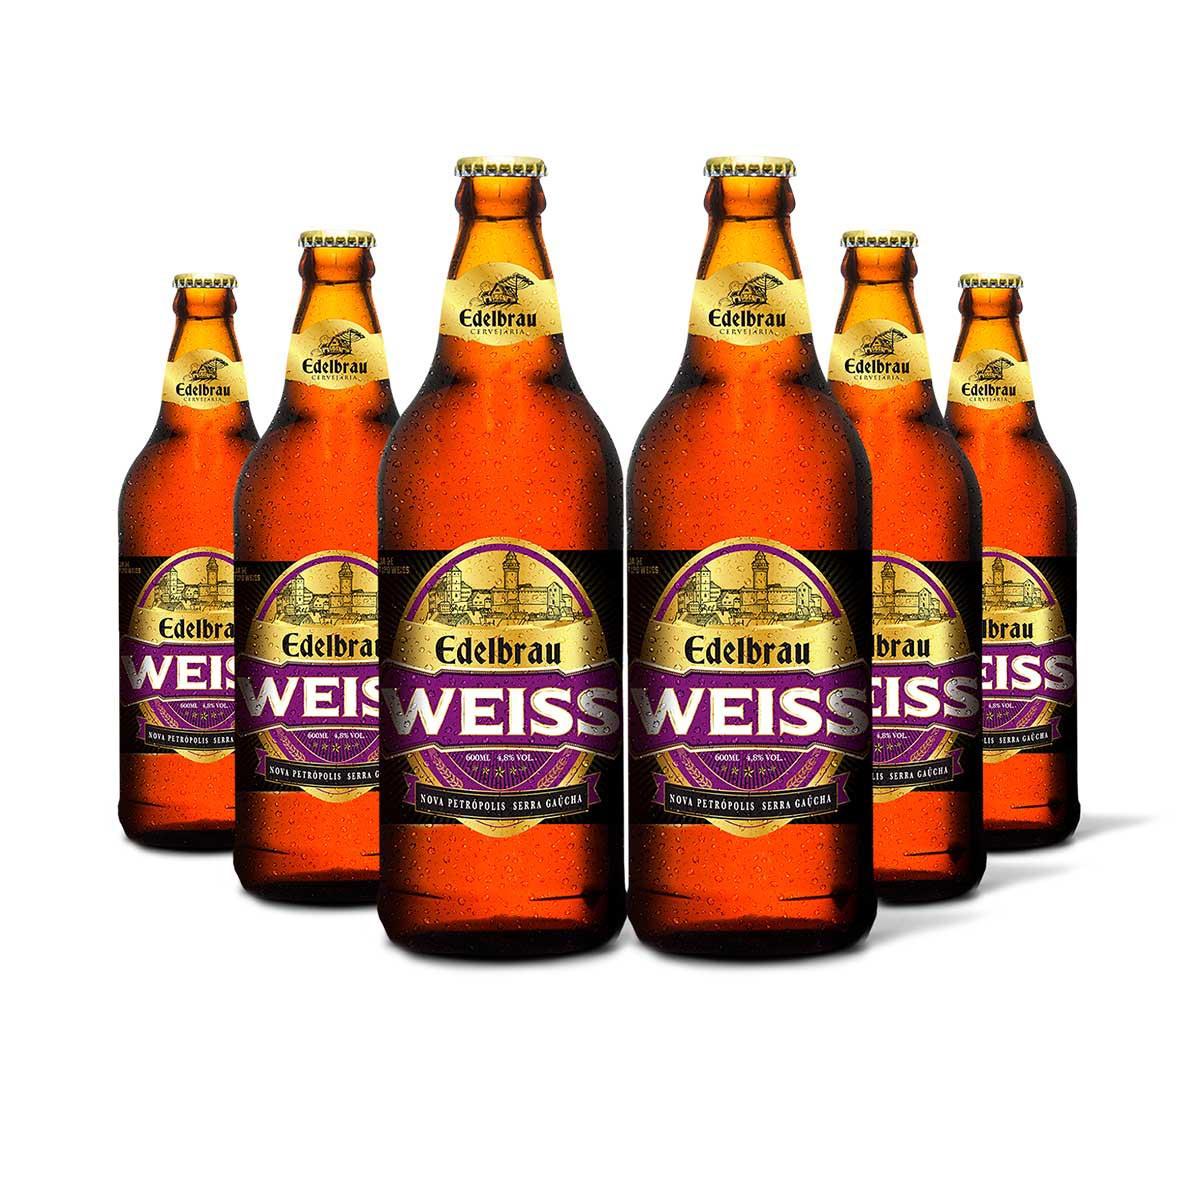 Pack Edelbrau Weiss 6 cervejas 600ml